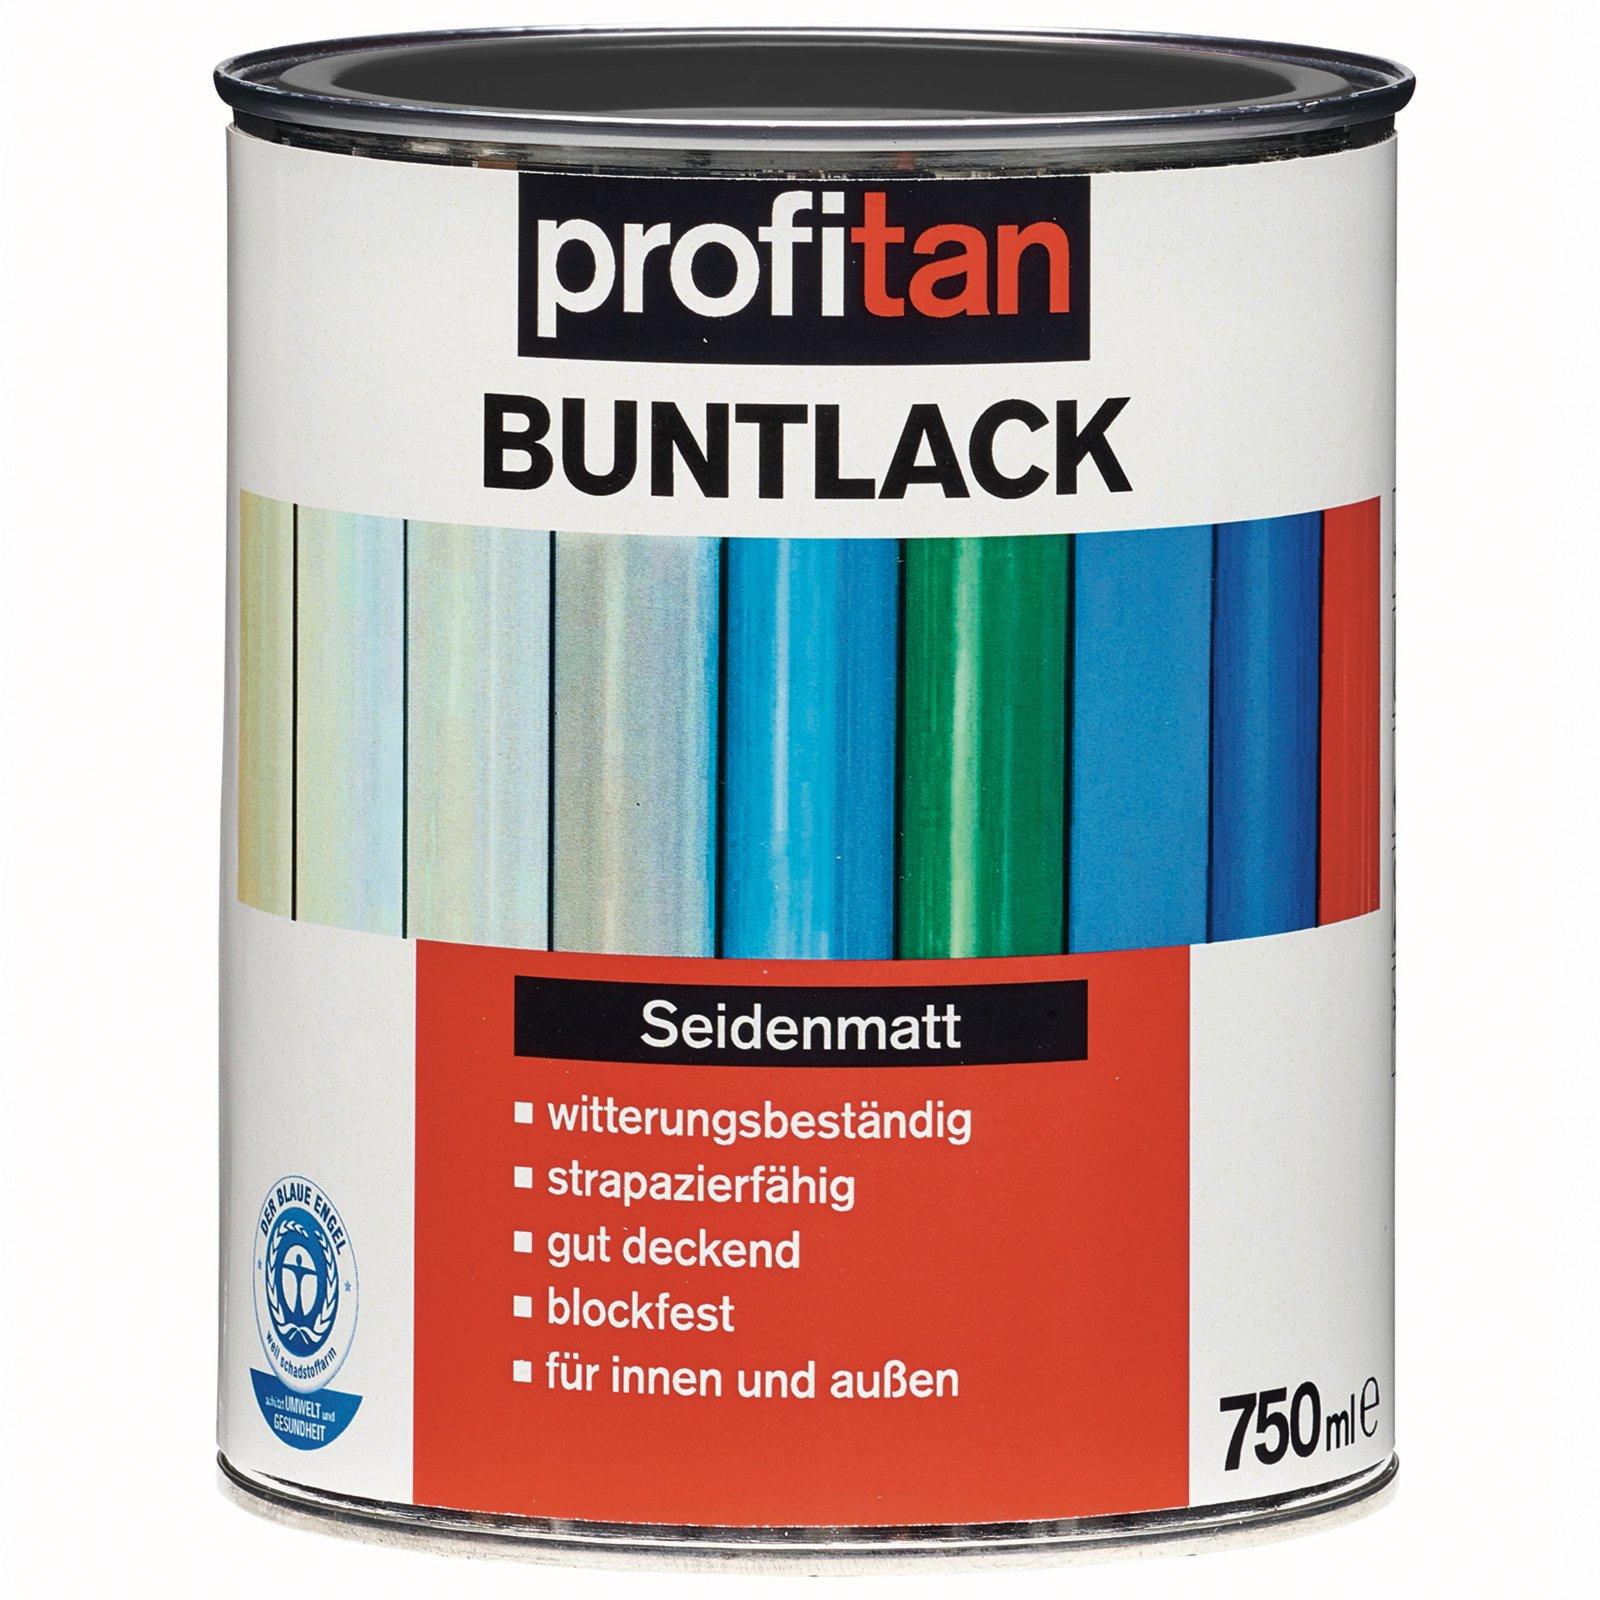 profitan Buntlack - anthrazit seidenmatt - 750 ml